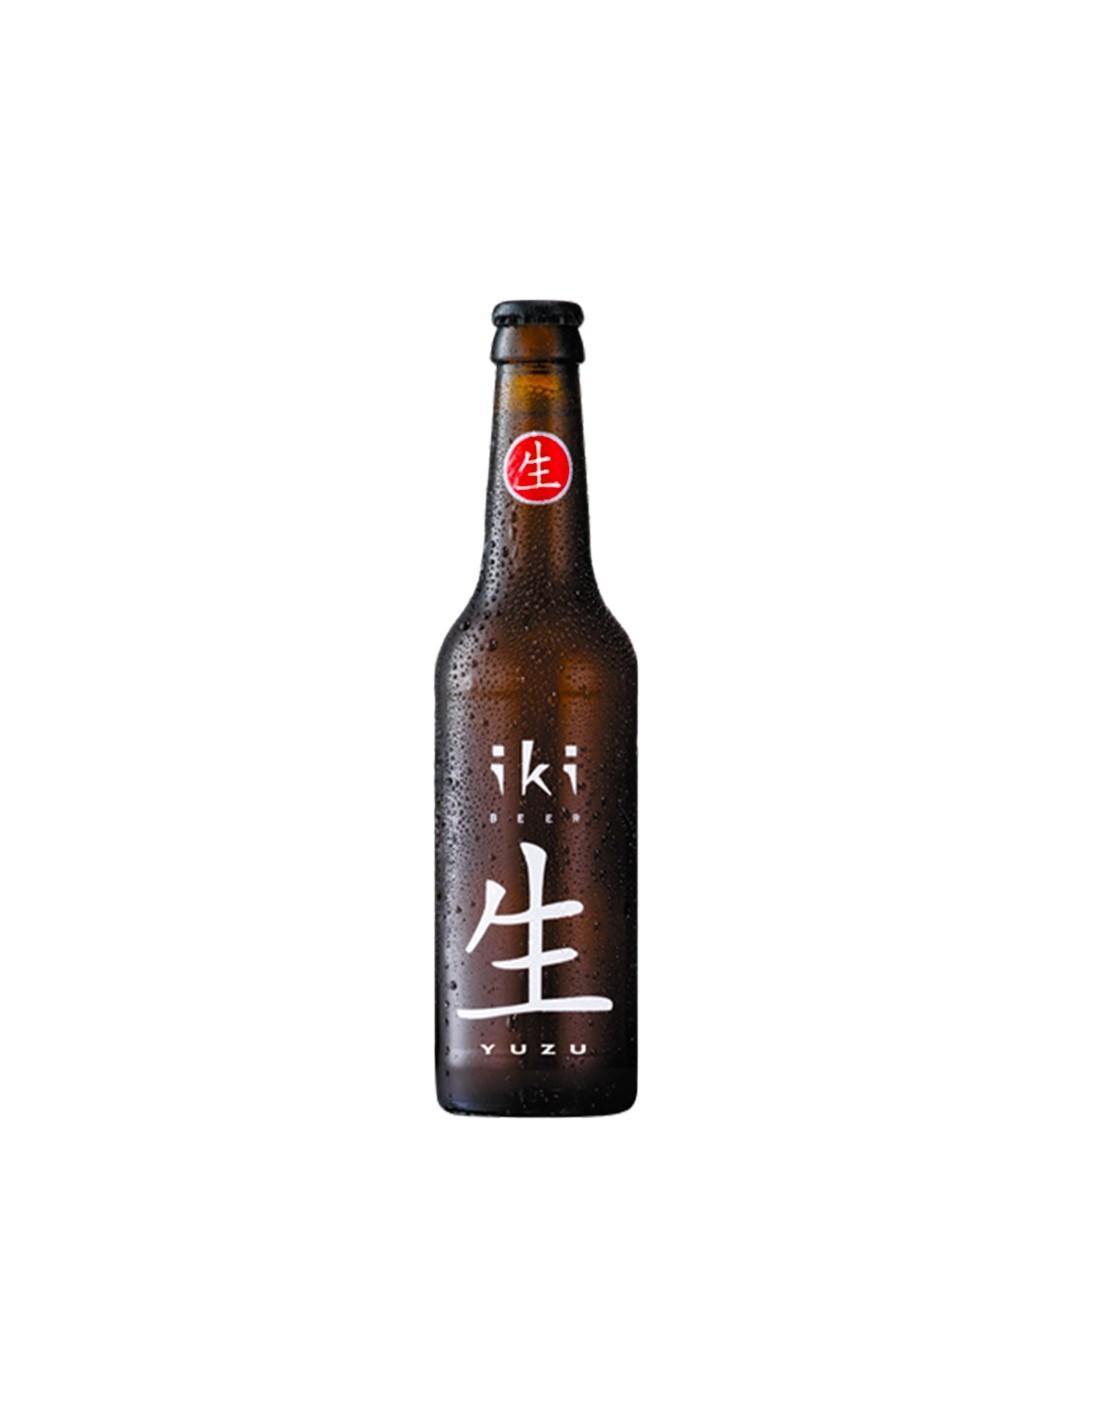 Bautura traditionala Iki Yuzu, 4.2% alc., 0.33L, Japonia